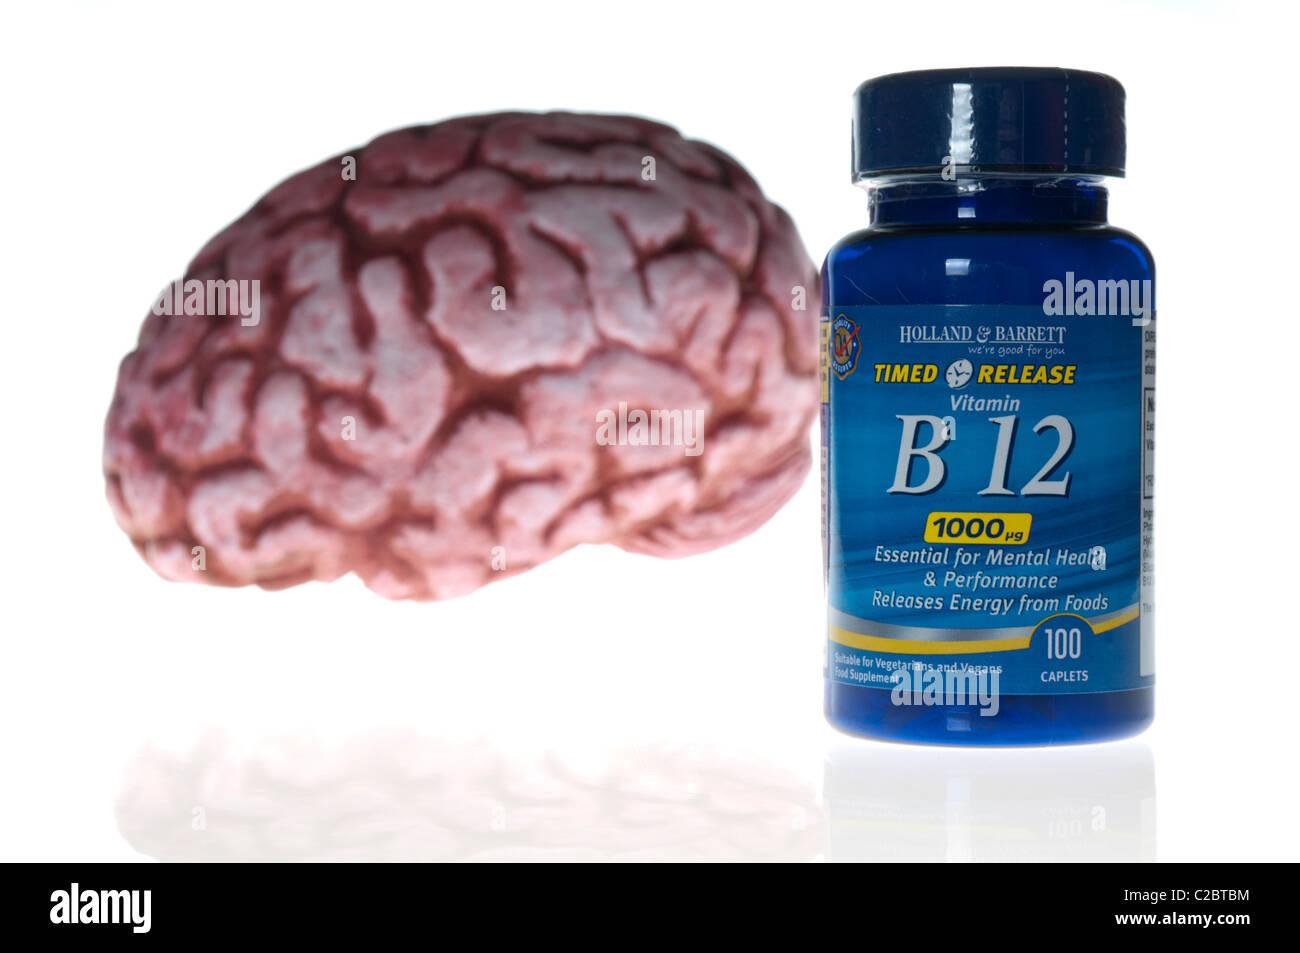 Bottle of vitamin B-12 tablets, 1000mg (1000 GDA) alongside a model brain - Stock Image